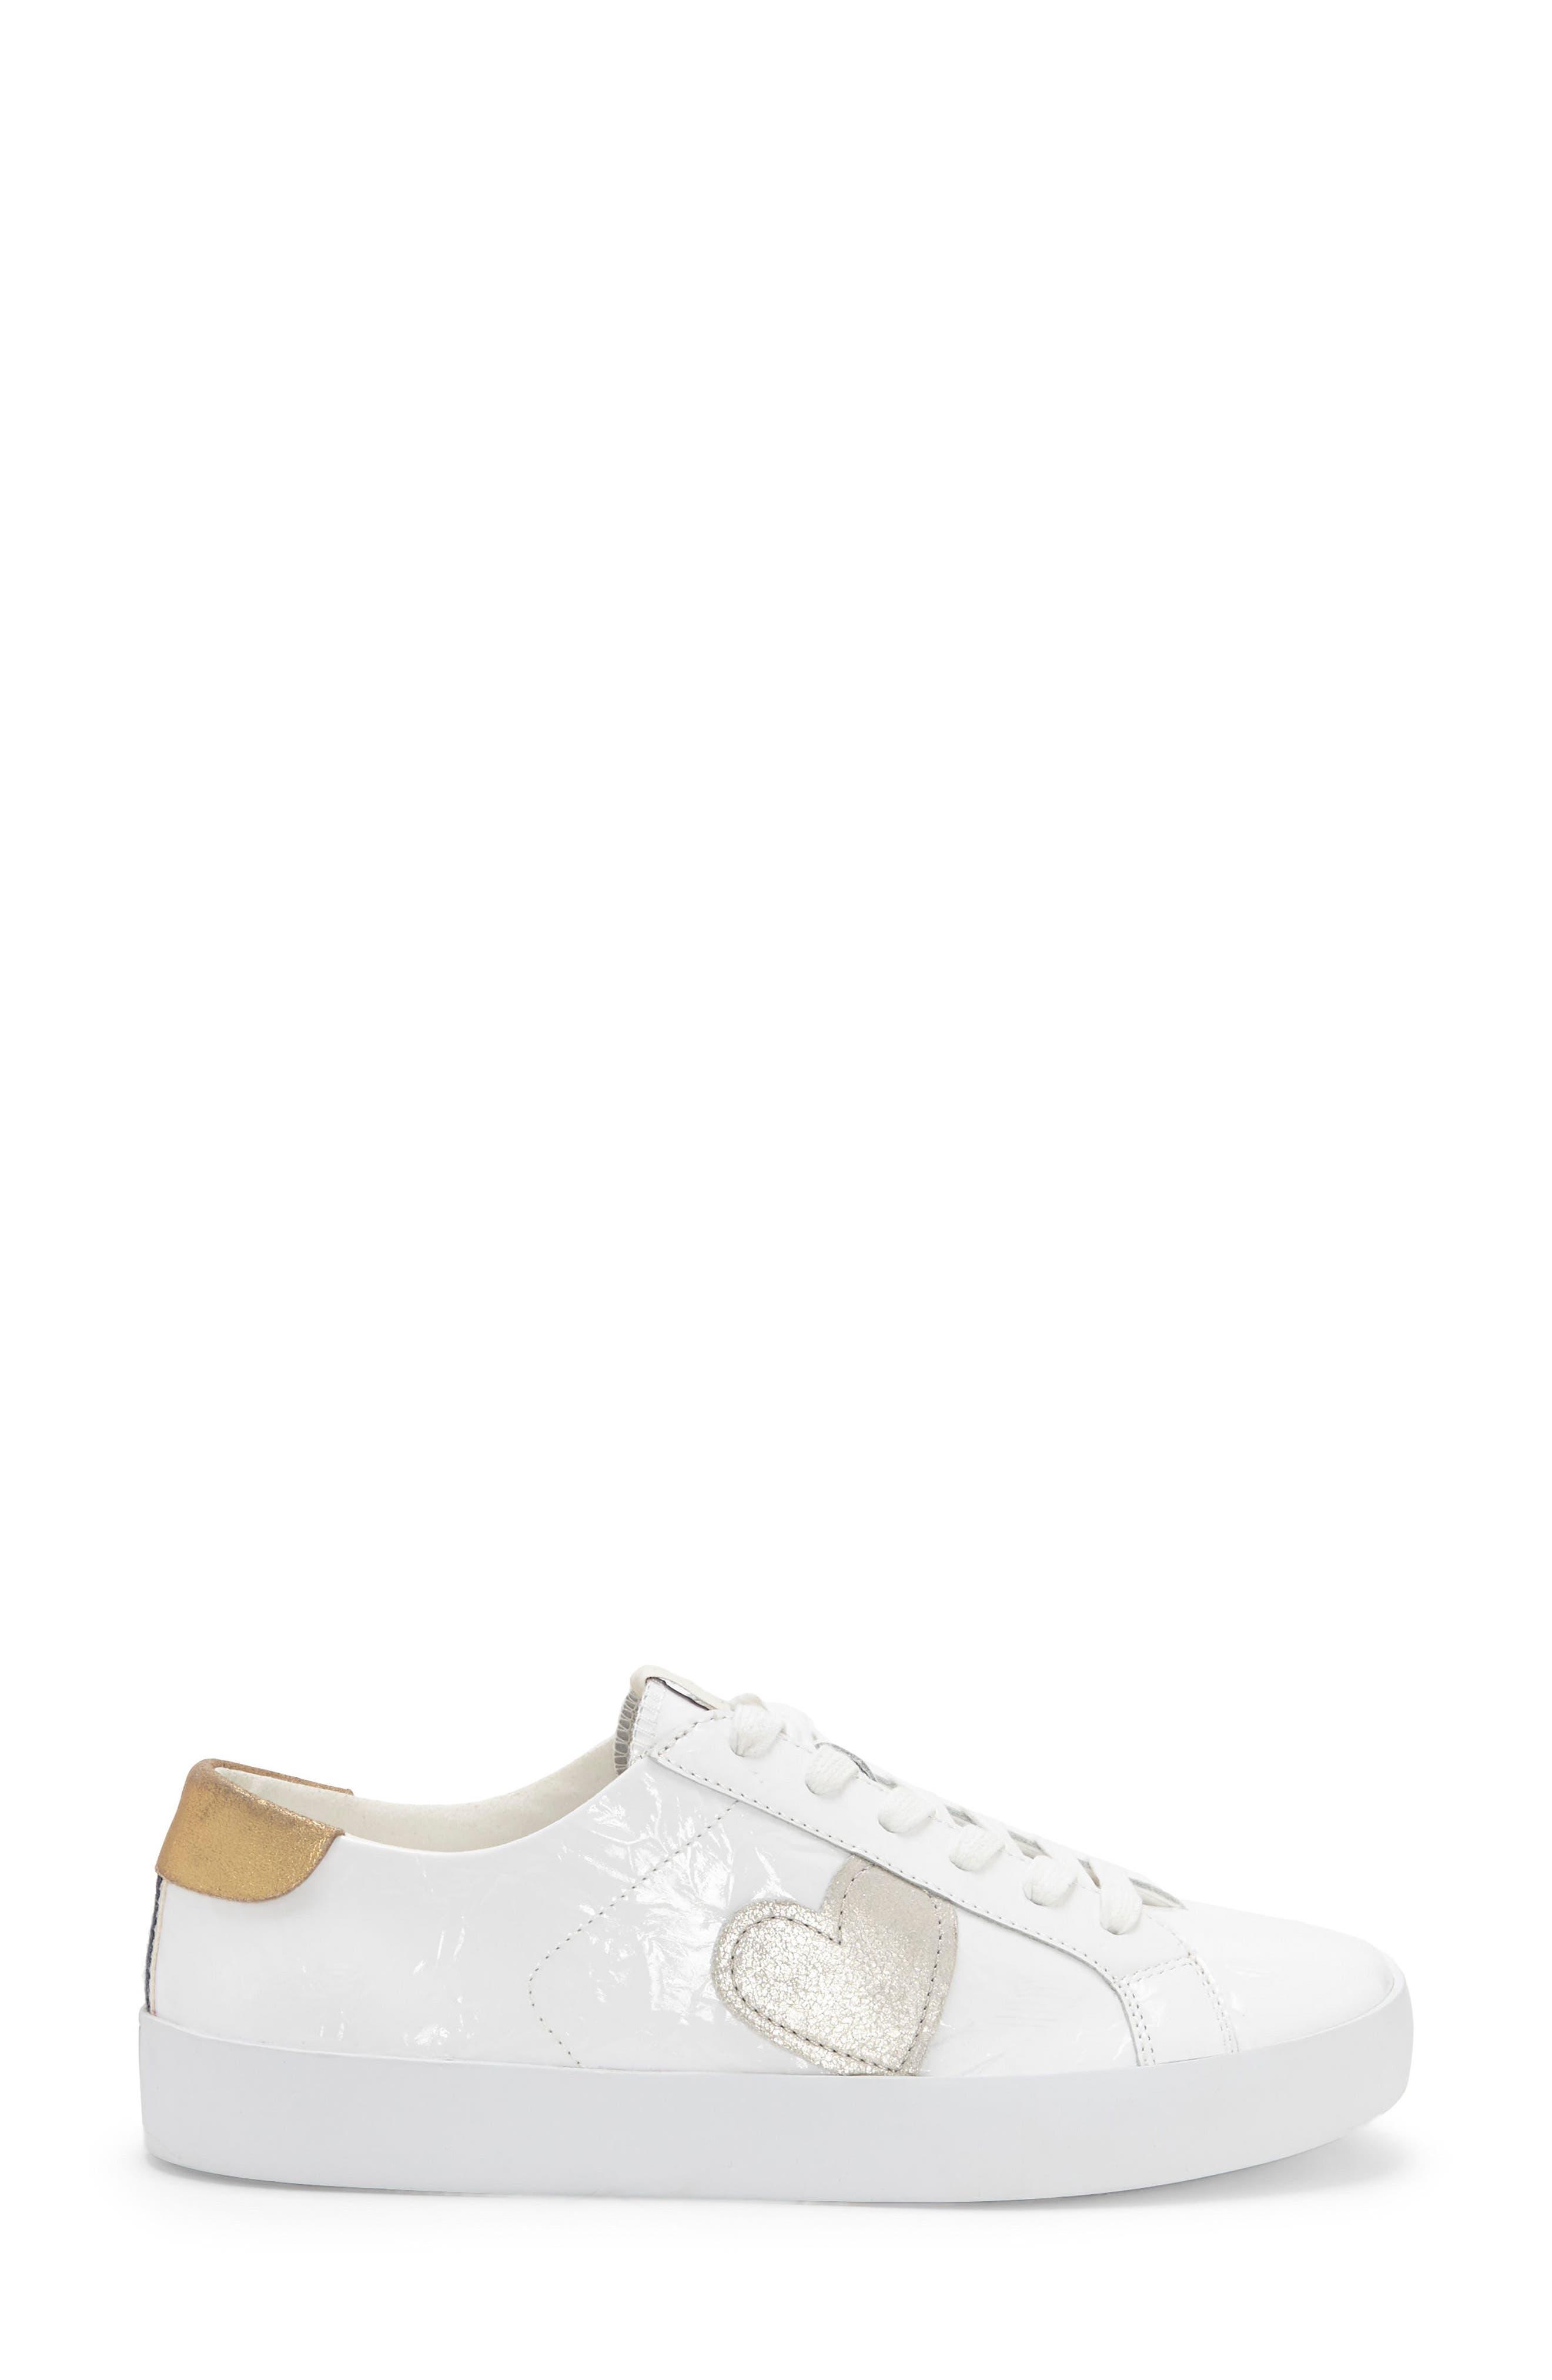 Gillen Sneaker,                             Alternate thumbnail 3, color,                             Pure White Crinkled Patent